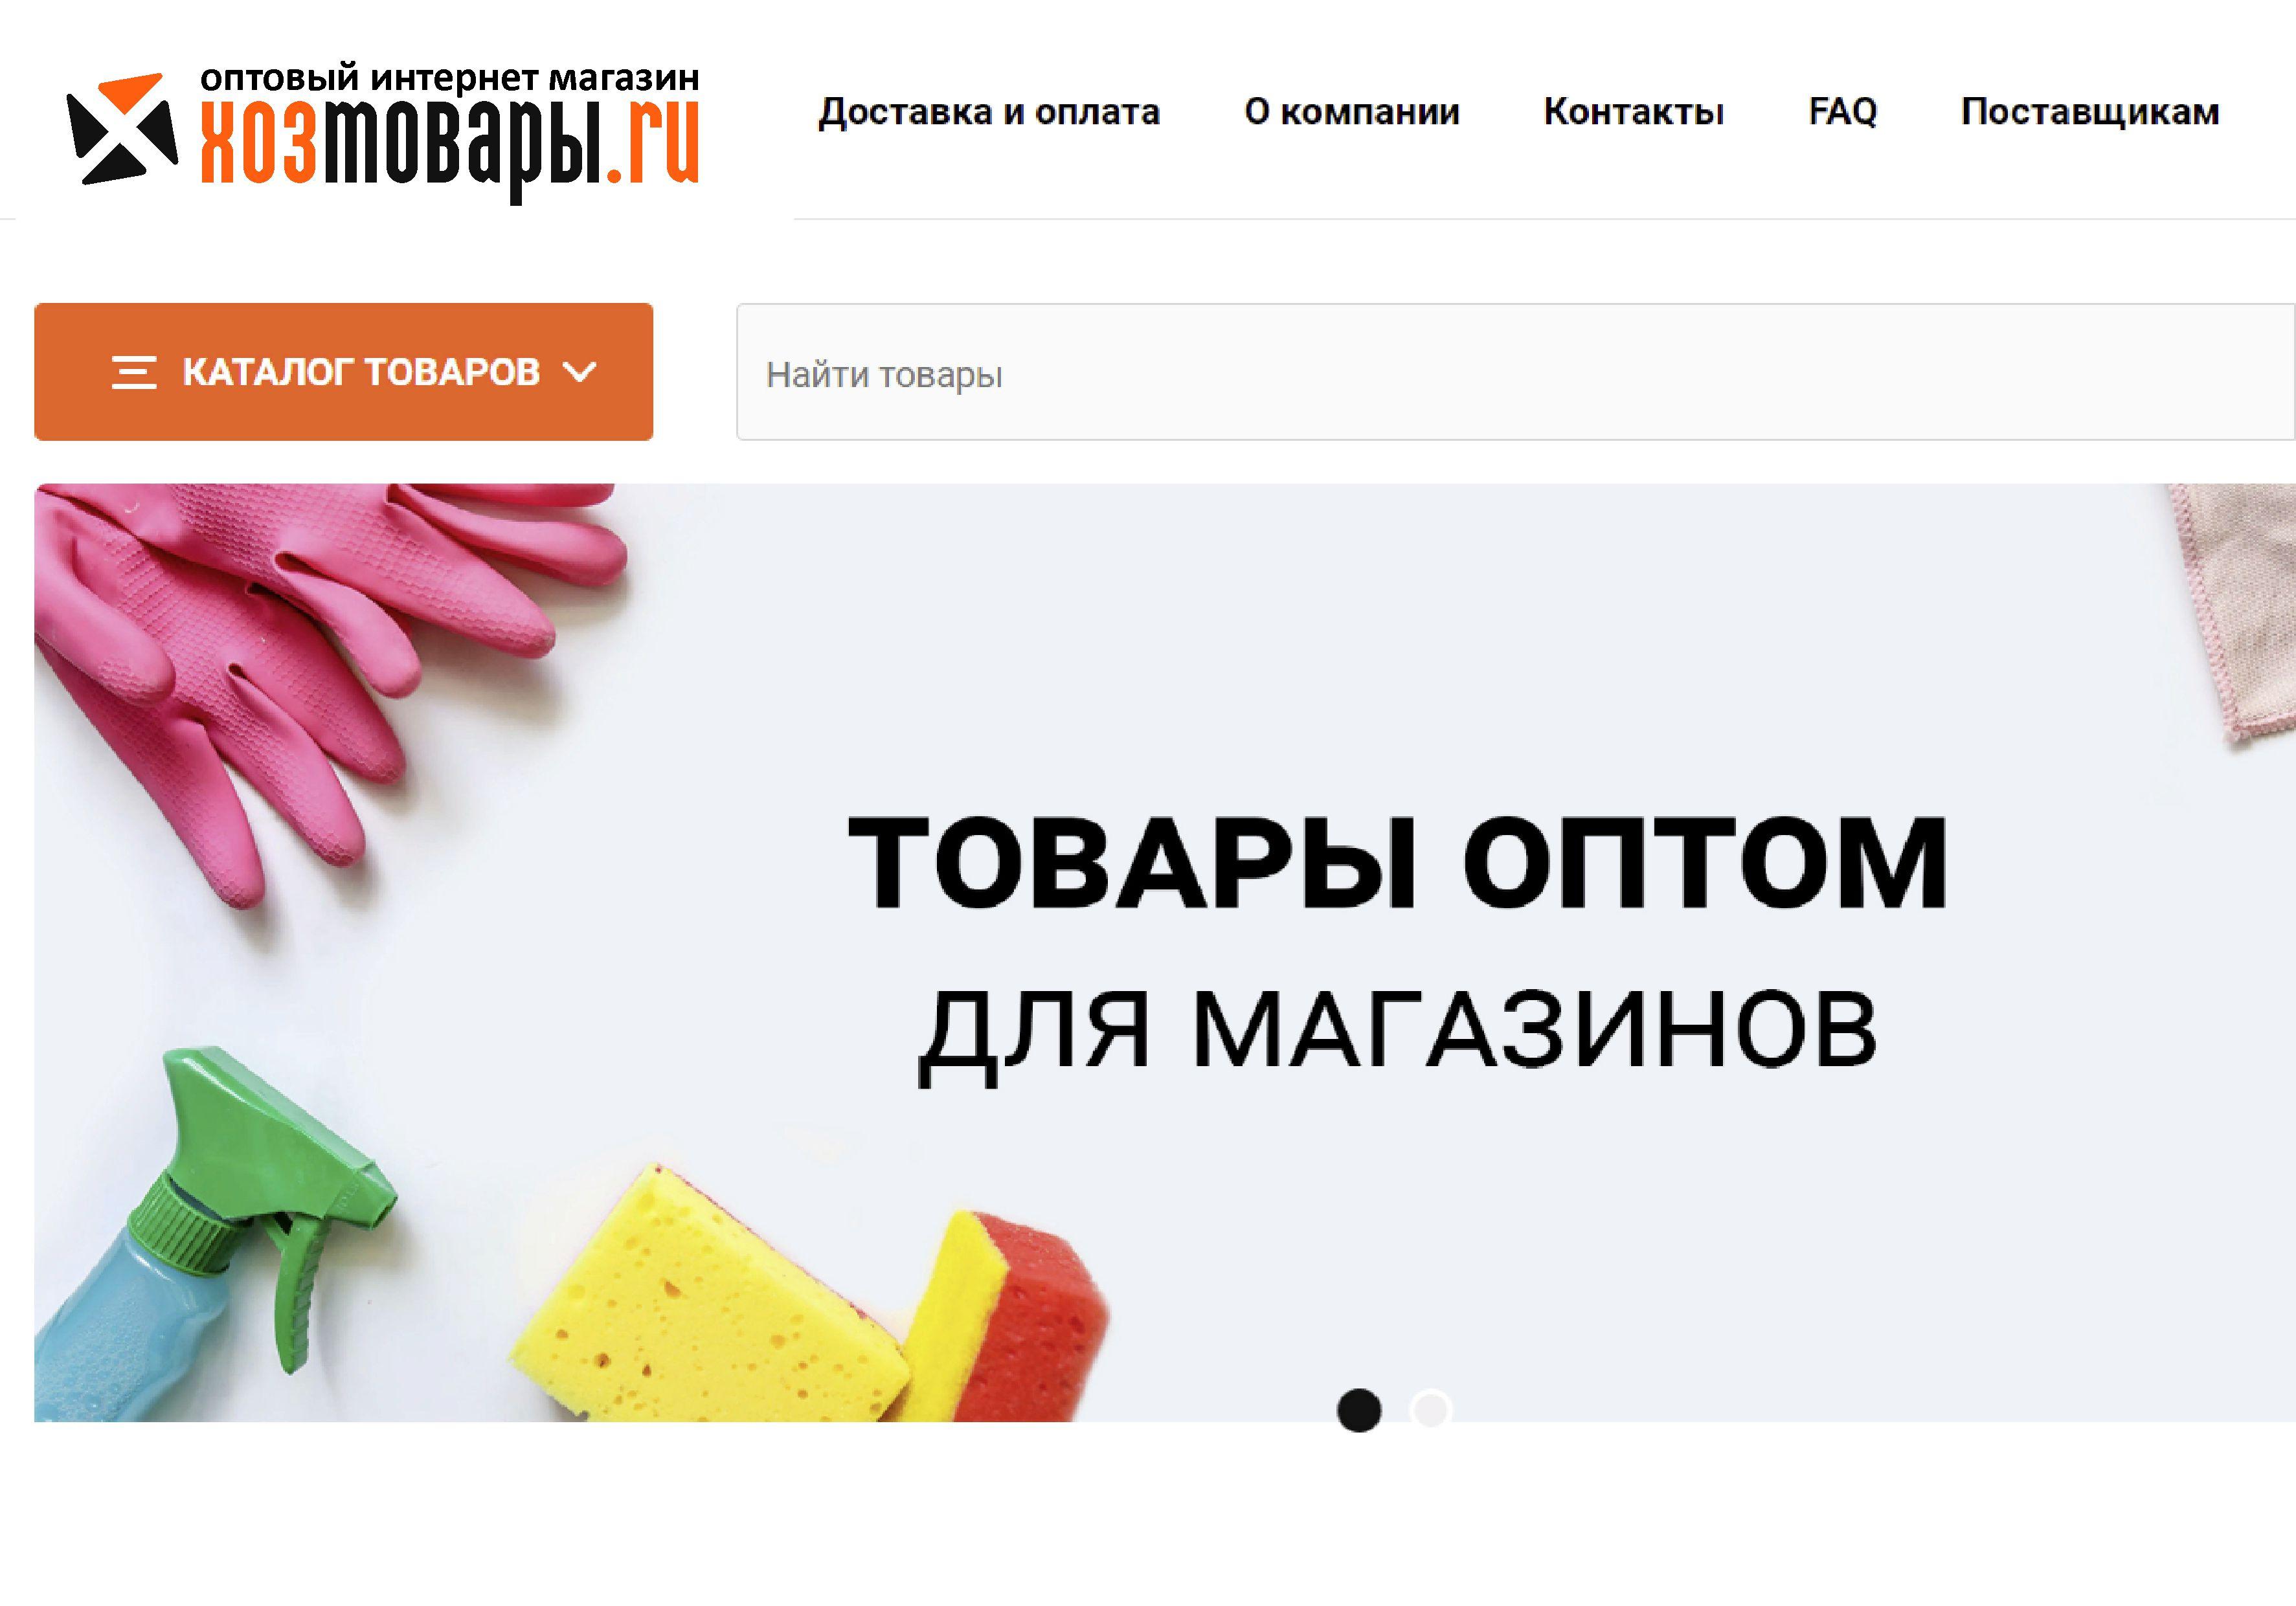 Разработка логотипа для оптового интернет-магазина «Хозтовары.ру» фото f_7436070d3d962e30.jpg